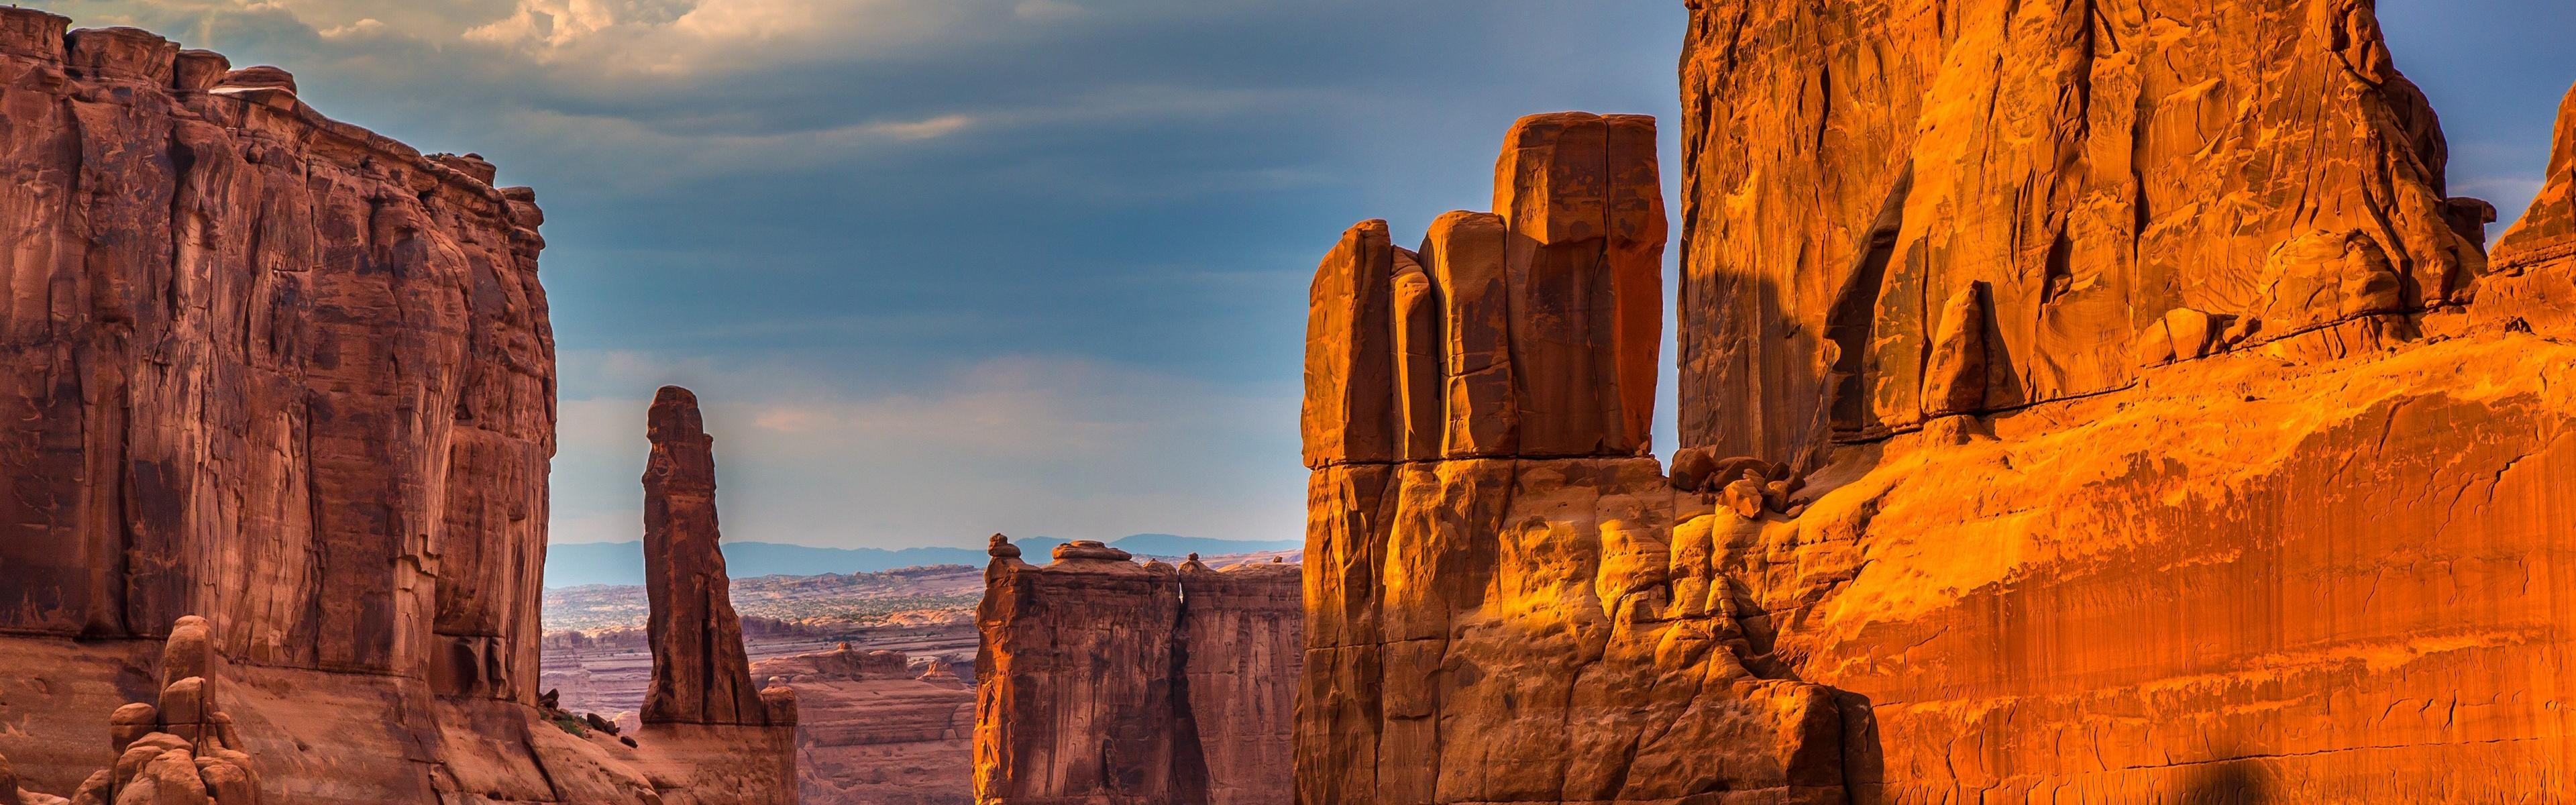 General 3840x1200 desert landscape clear sky canyon sunshade rocks nature